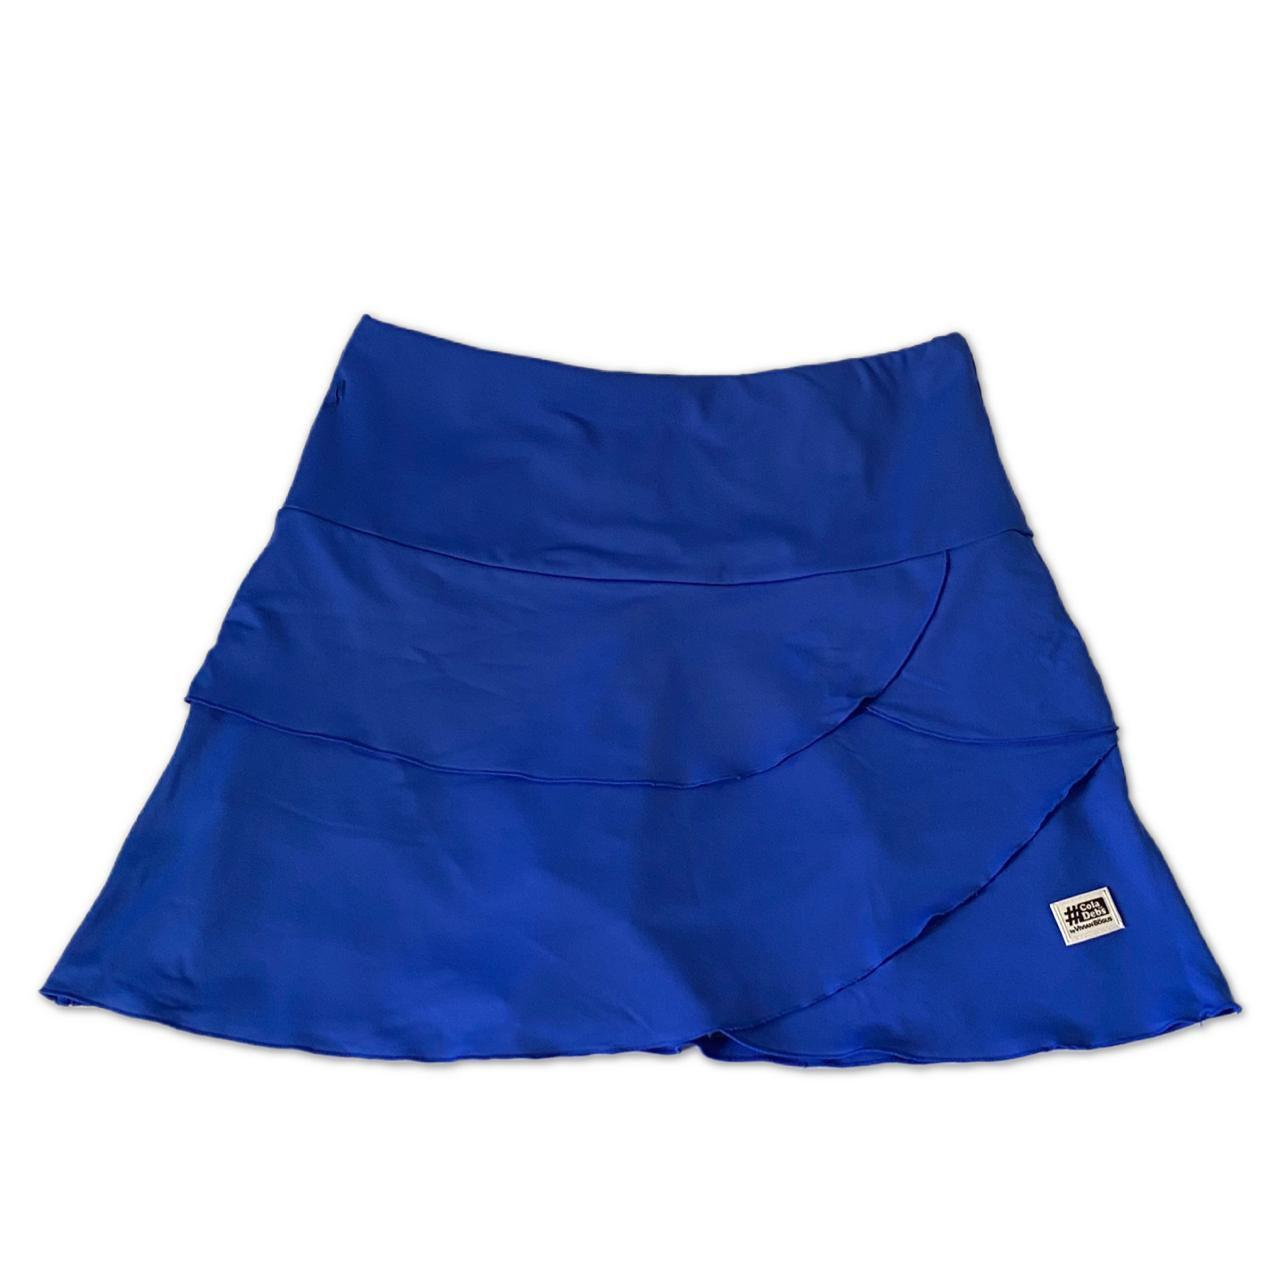 Saia fitness camadas azul royal ( novo modelo!)